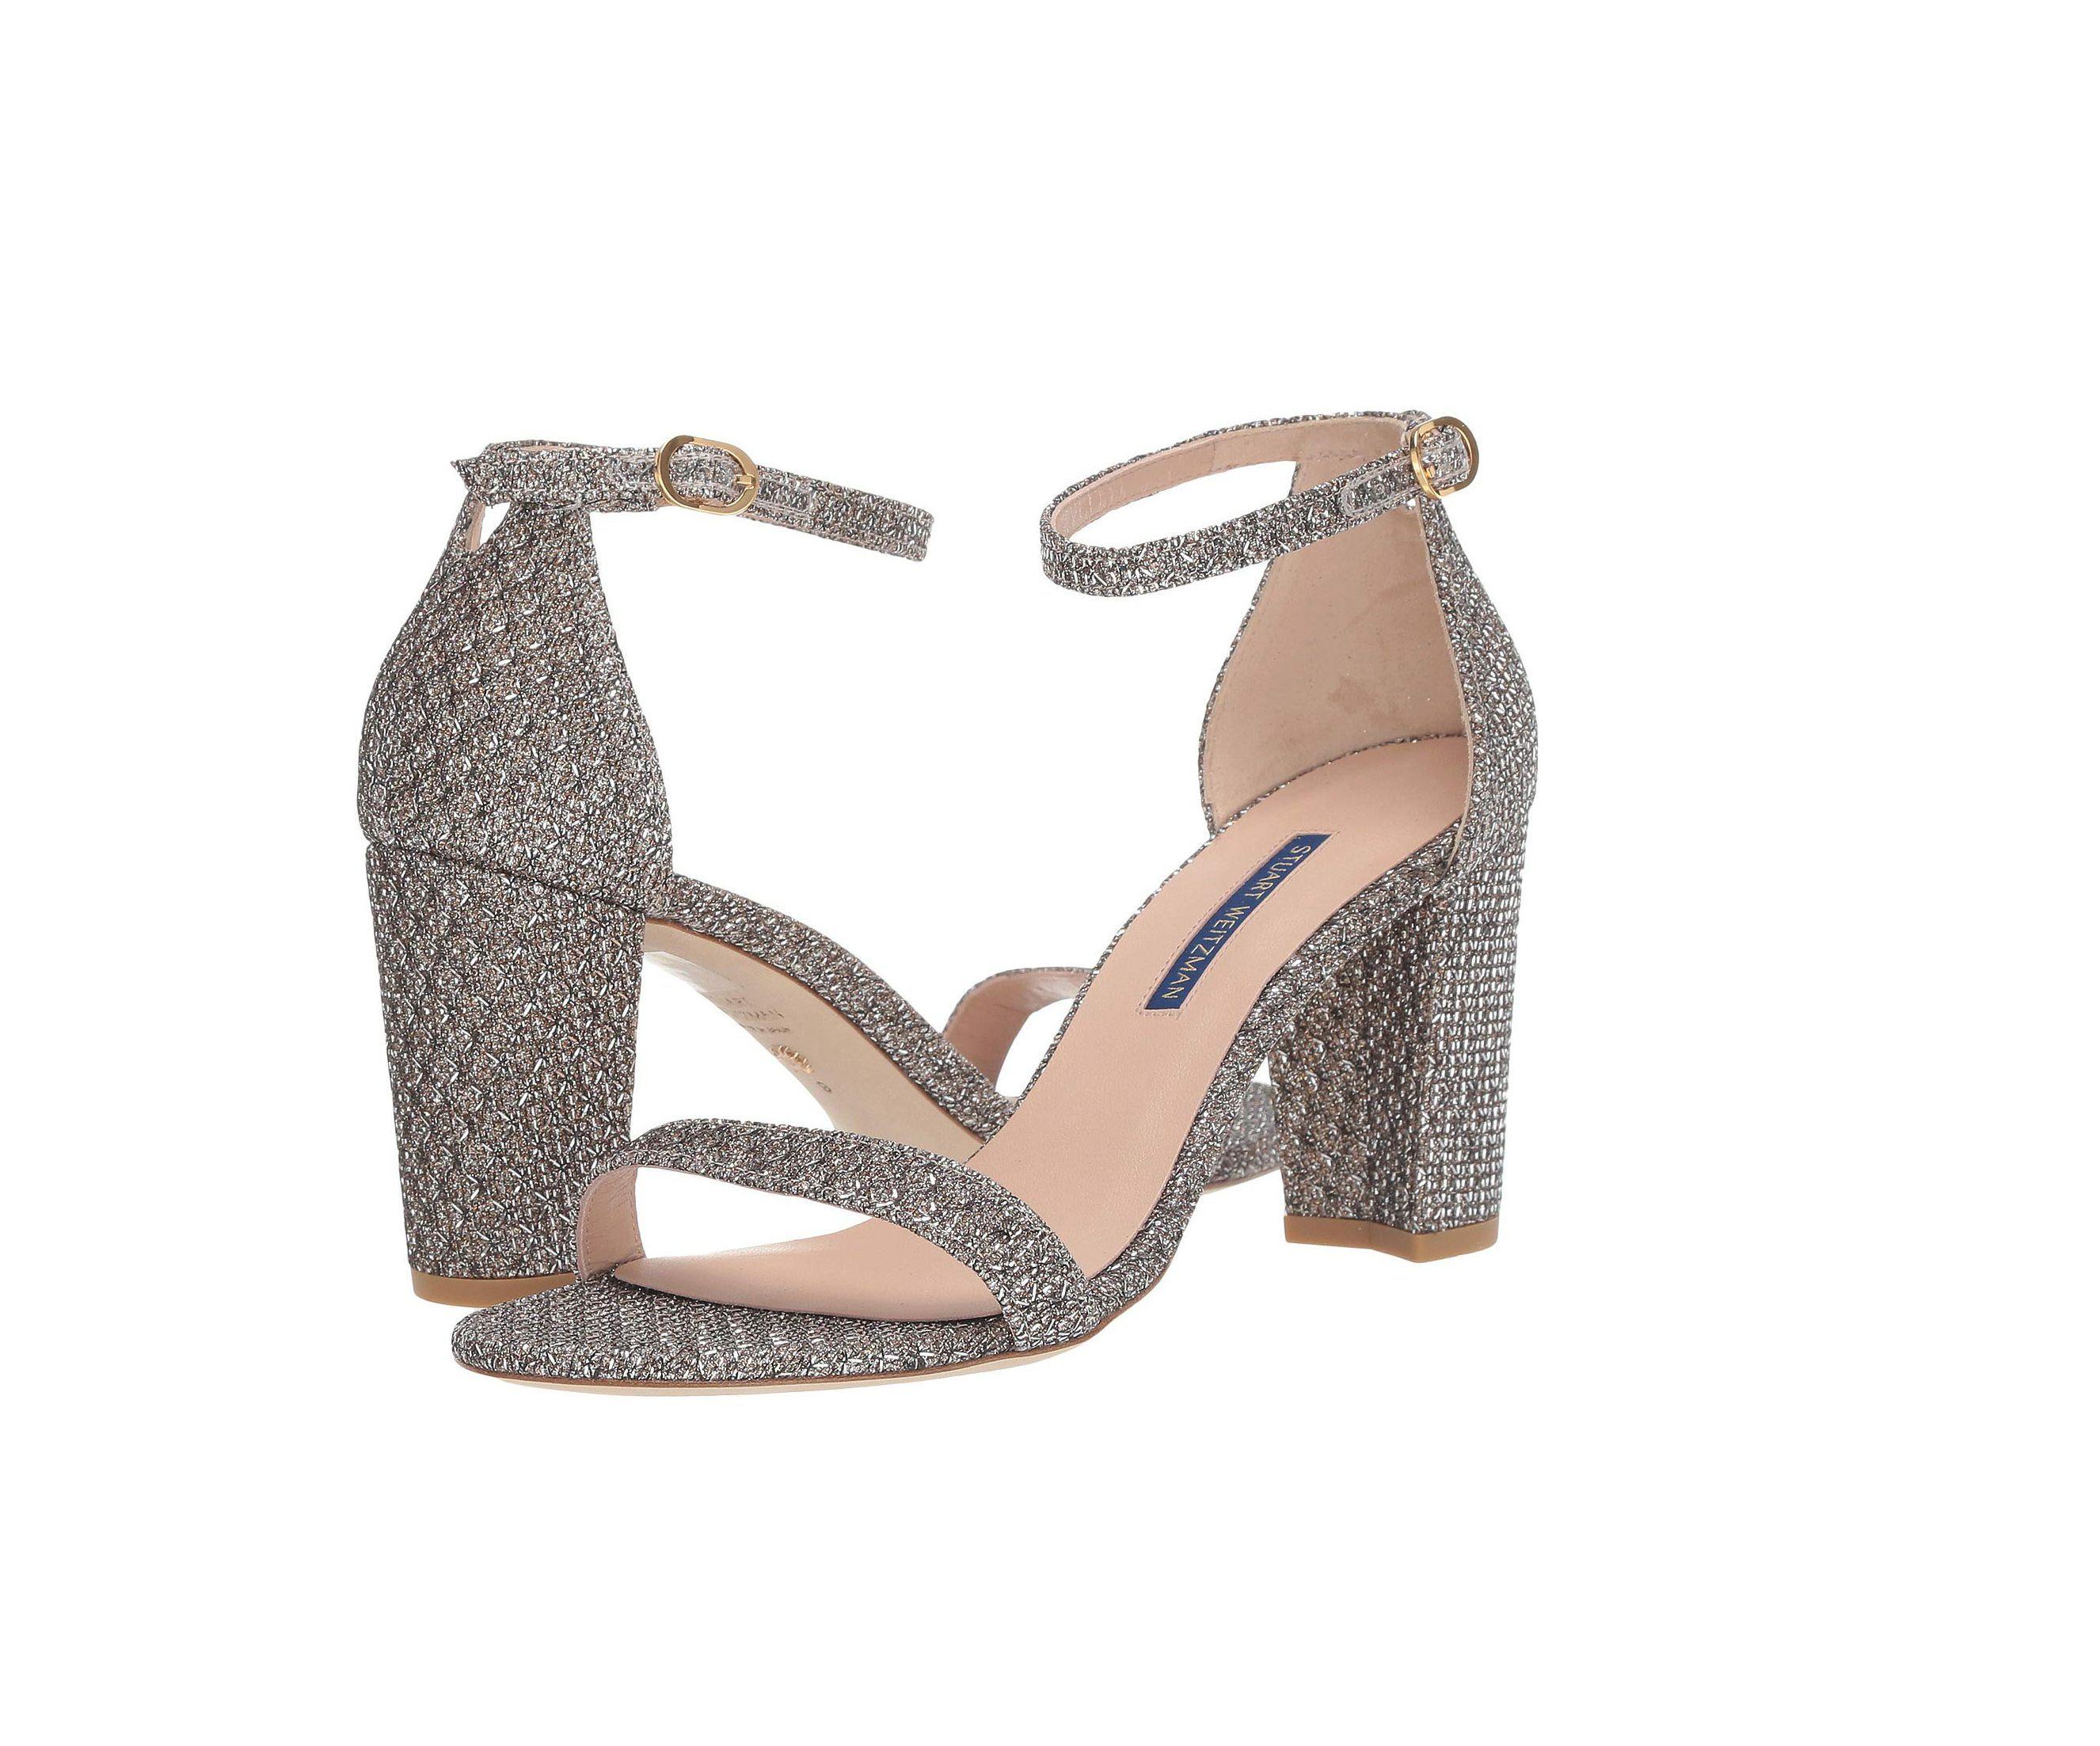 orthotic evening shoes